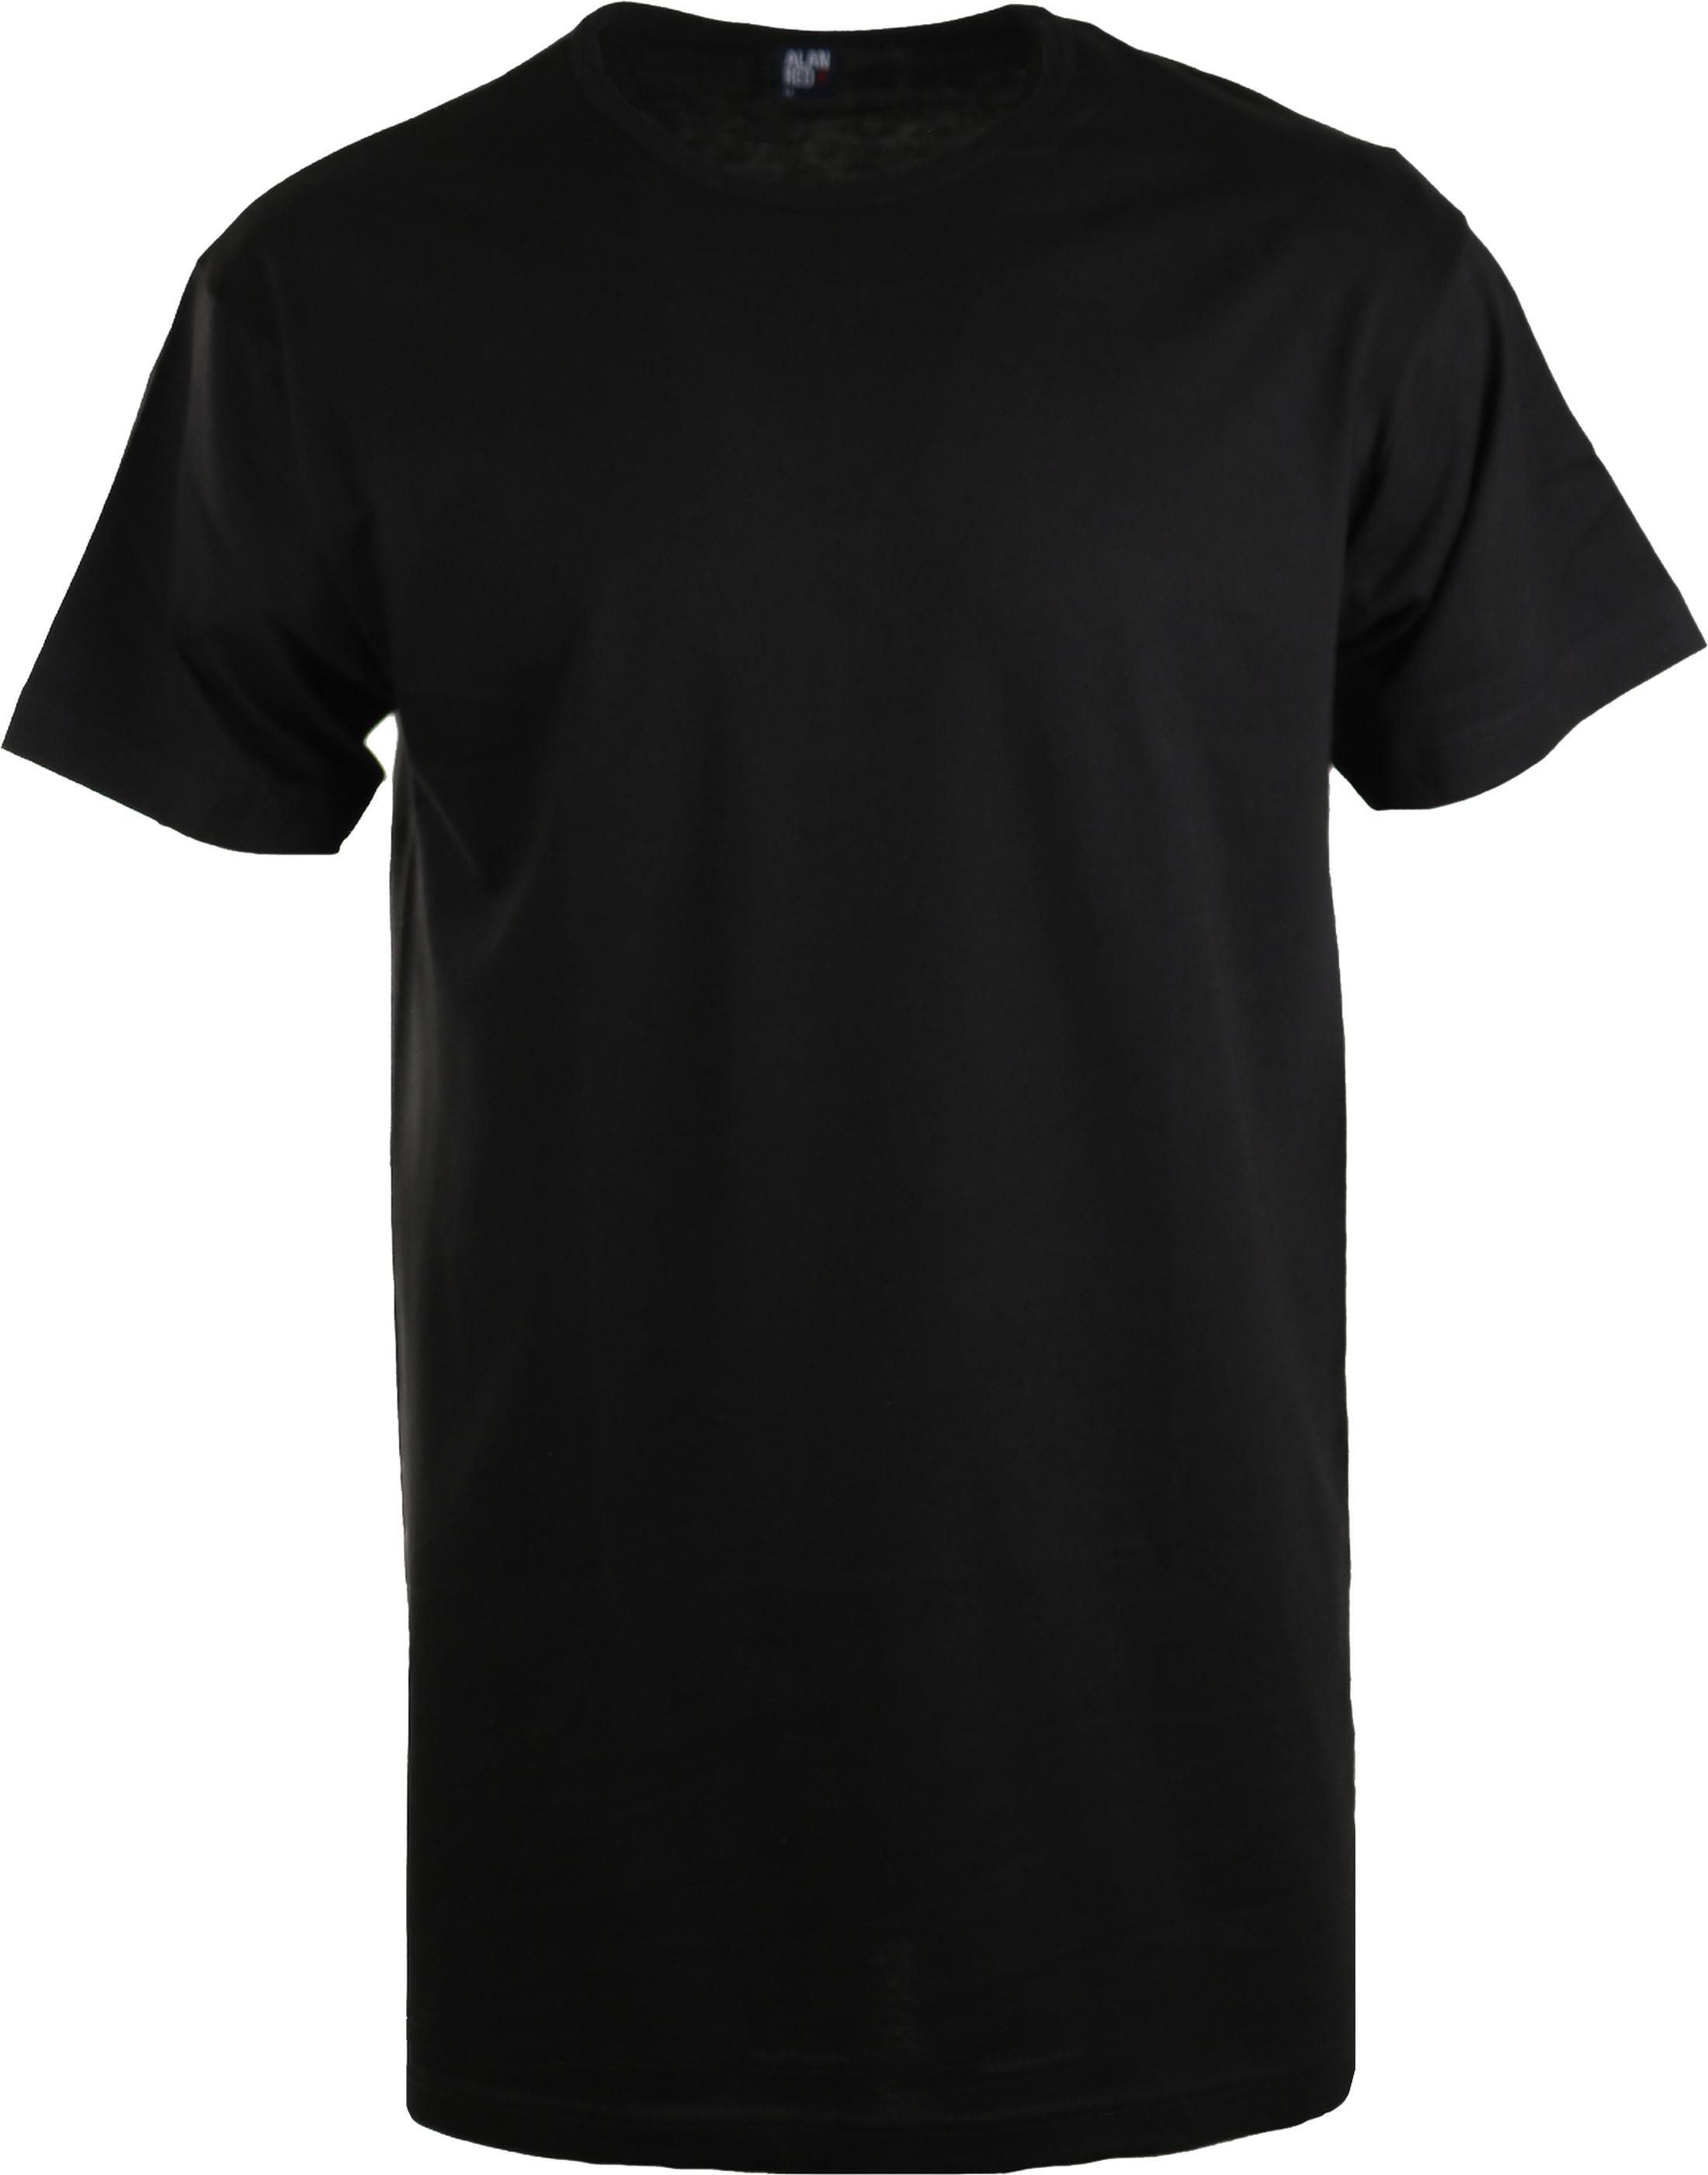 Alan Red Derby Extra Lang T-Shirt Zwart (1Pack) foto 0